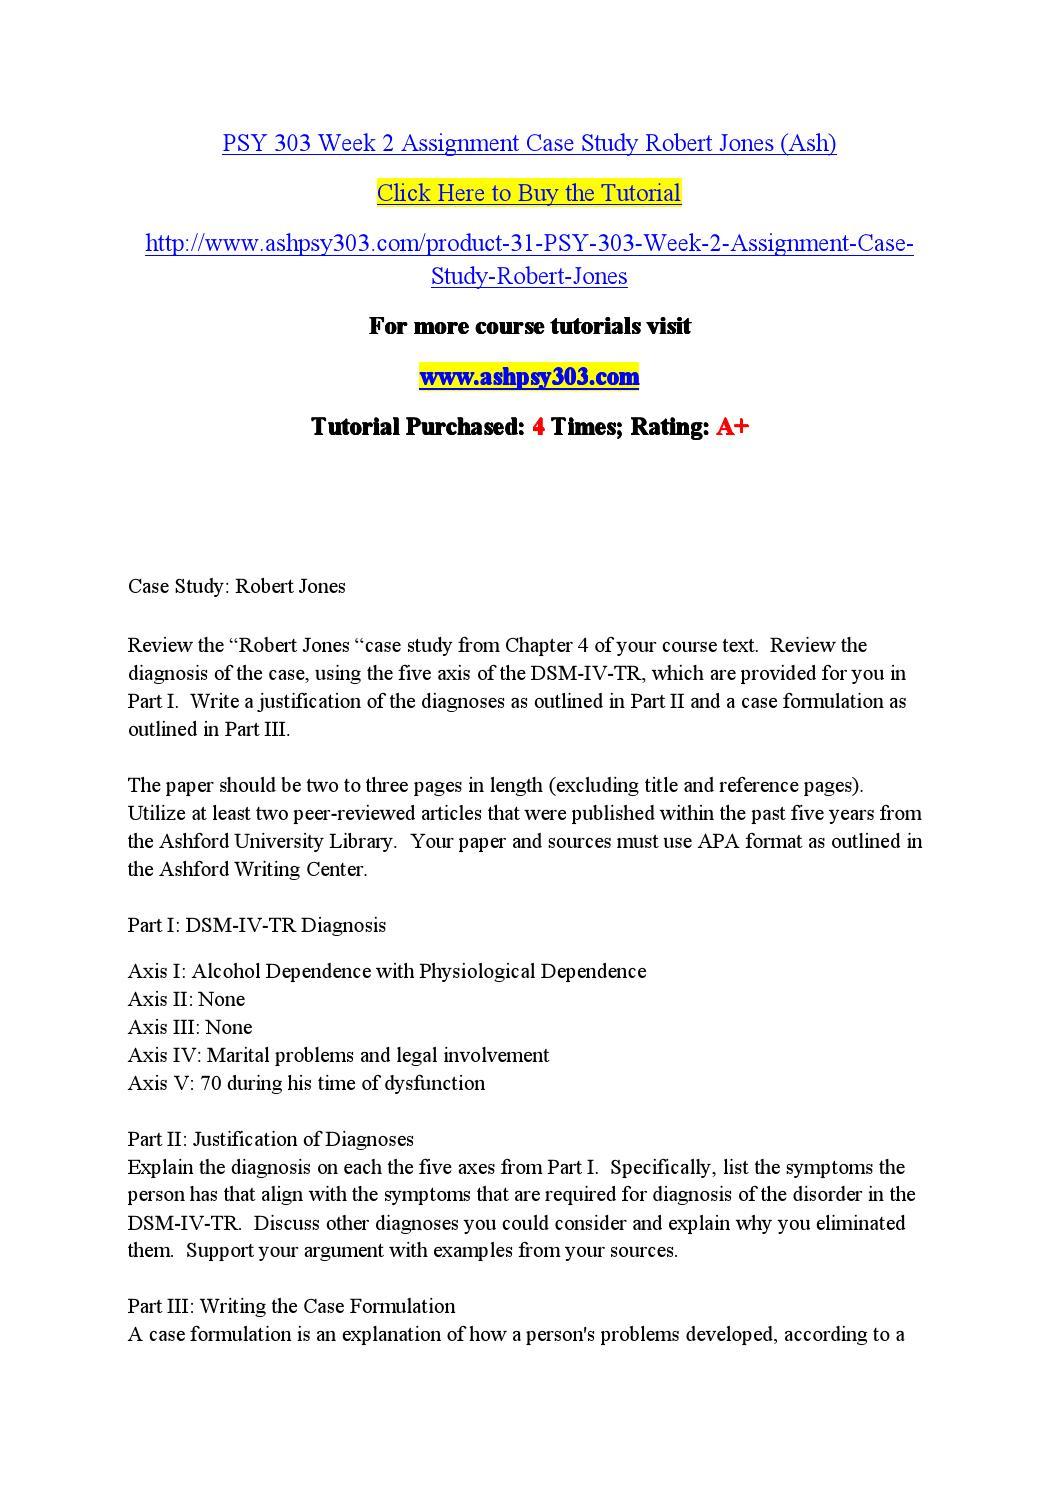 Psy 303 week 2 assignment case study robert jones (ash) by